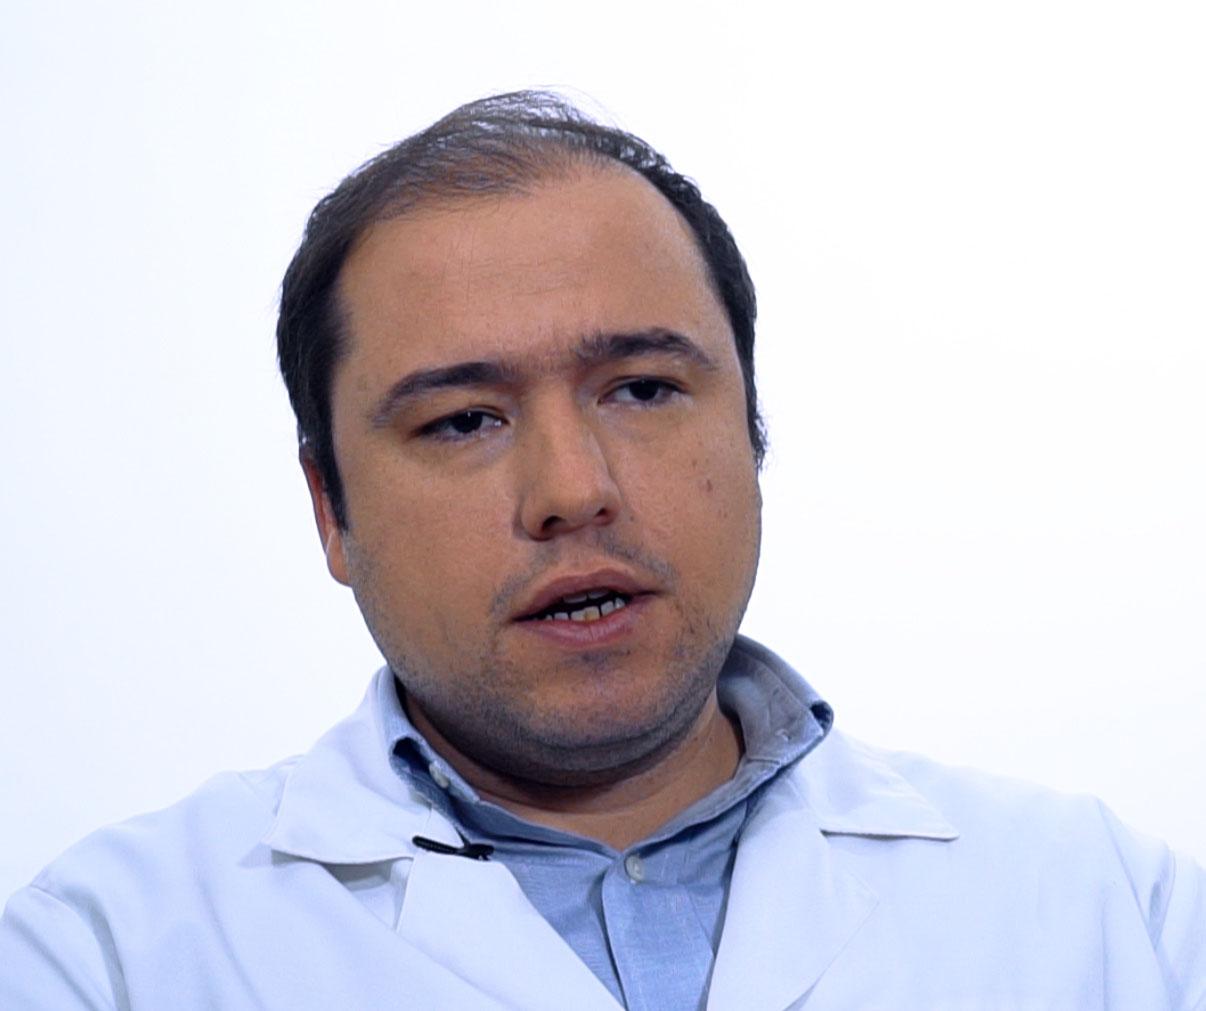 Guilherme Fleury Perini